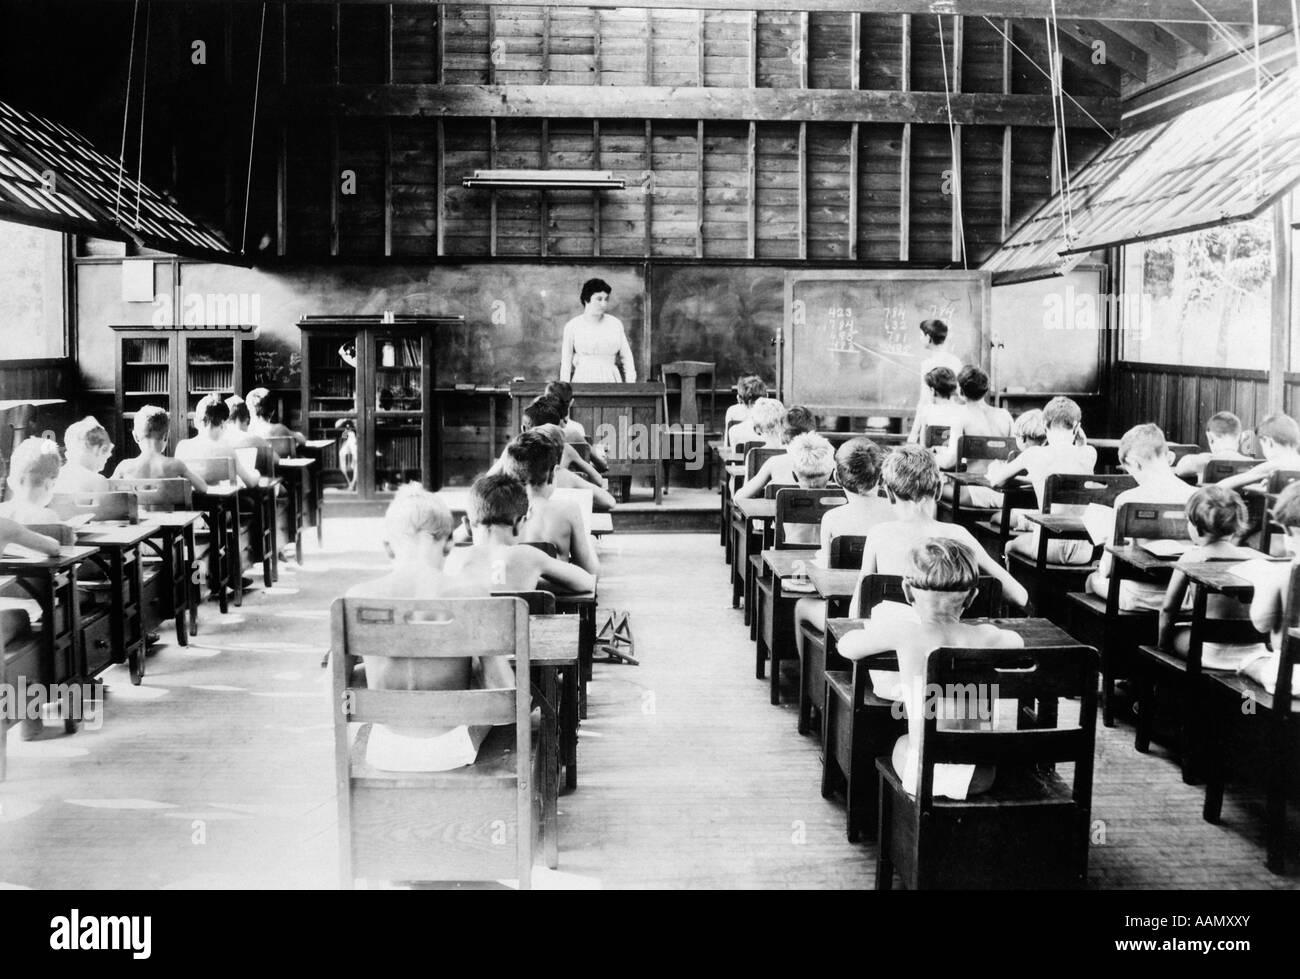 1920s PERRYSBURG SANITARIUM FOR TUBERCULAR CHILDREN STRIPPED TO WAIST WEARING LITTLE STUDYING CLASSROOM - Stock Image